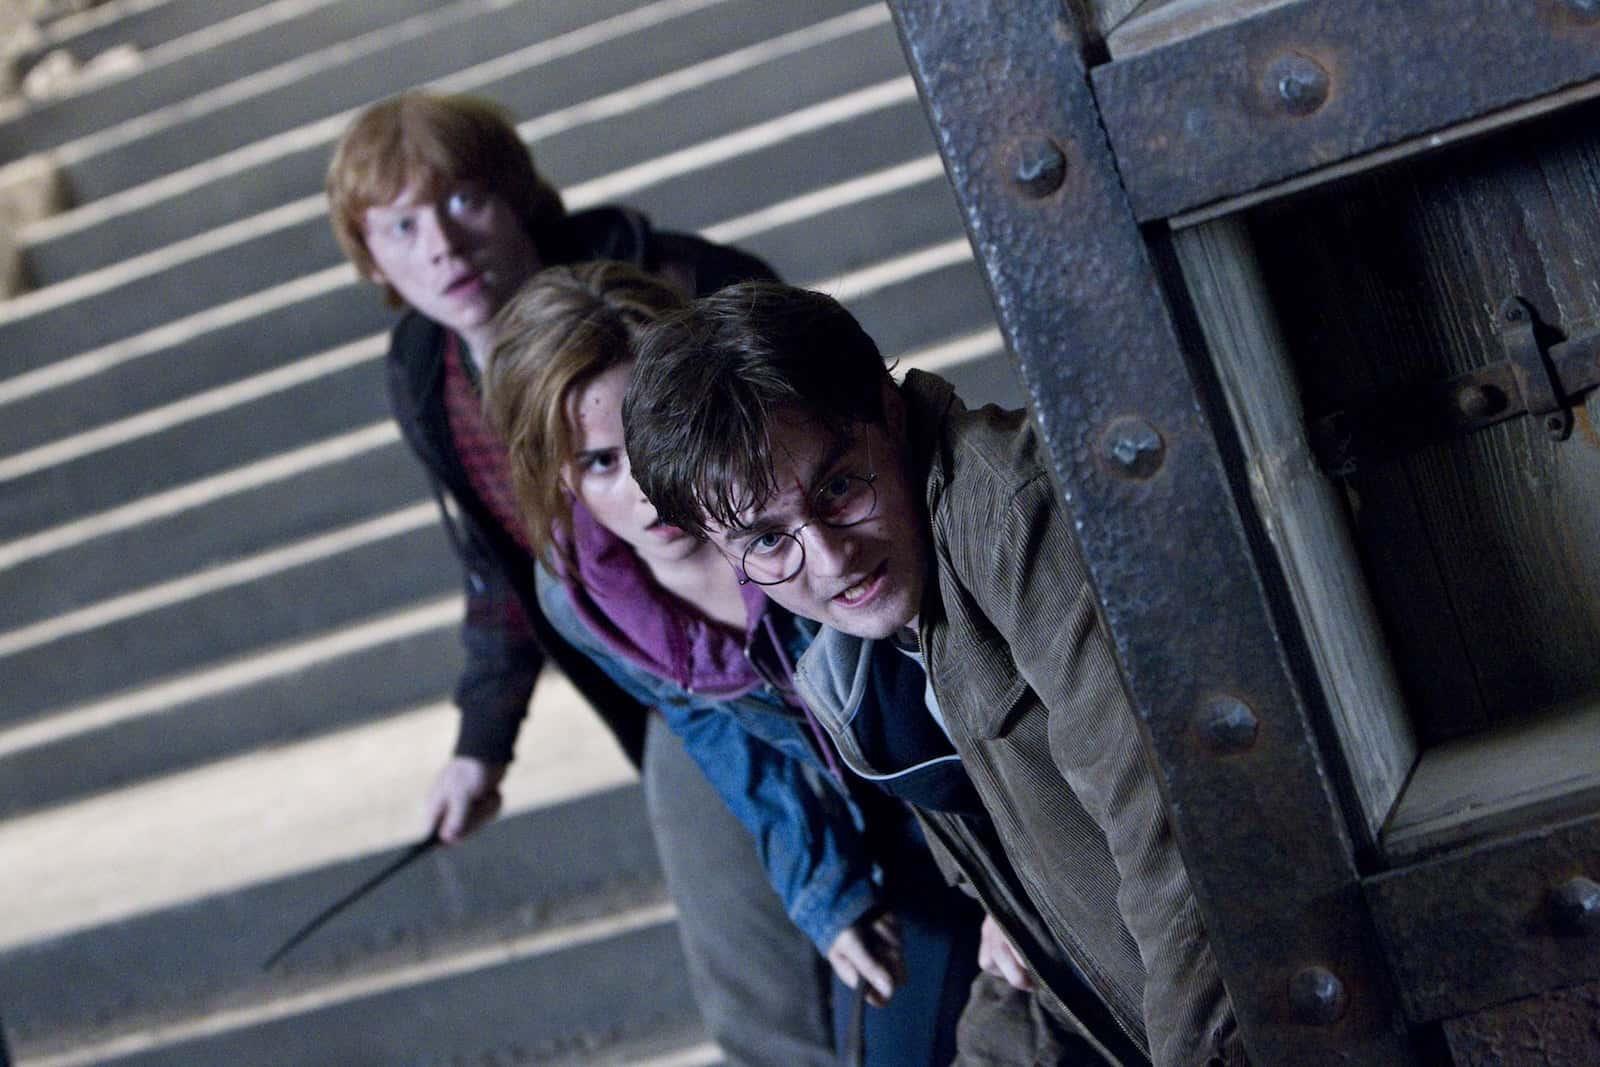 Dutch Angle Shots Example - Dutch Angle Camera - Harry Potter